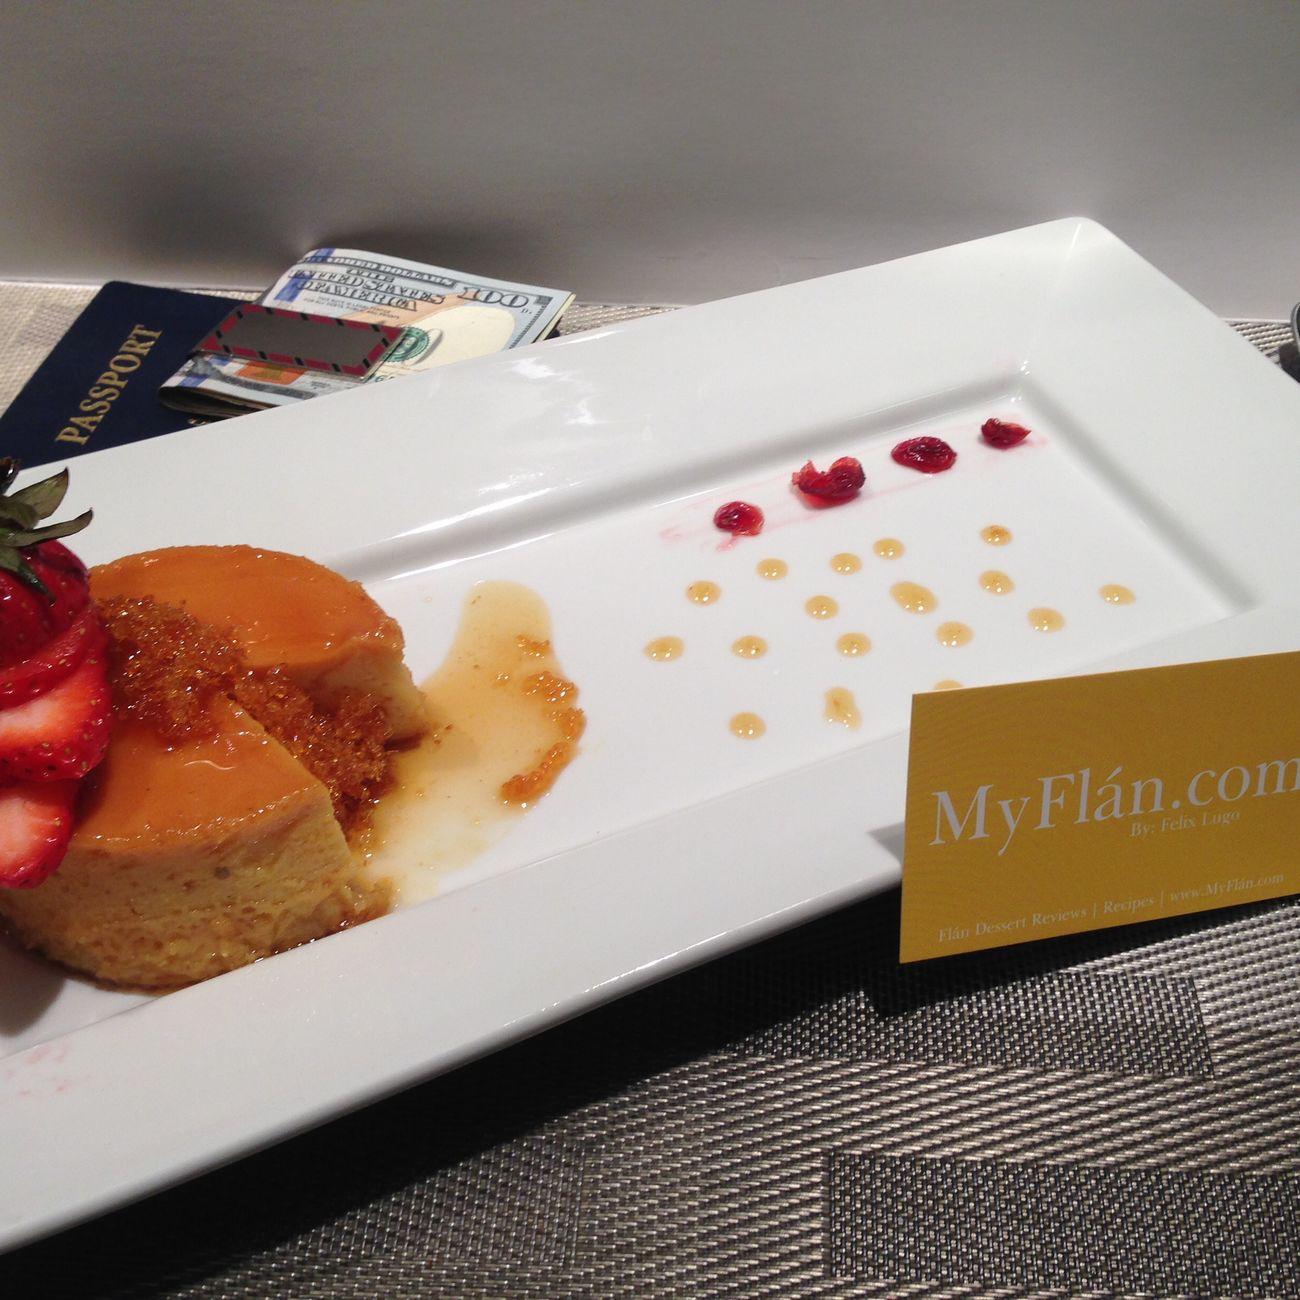 Pudim Flan Desserts Bakery Myflan Sugar Passport Cavier Foodporn Food